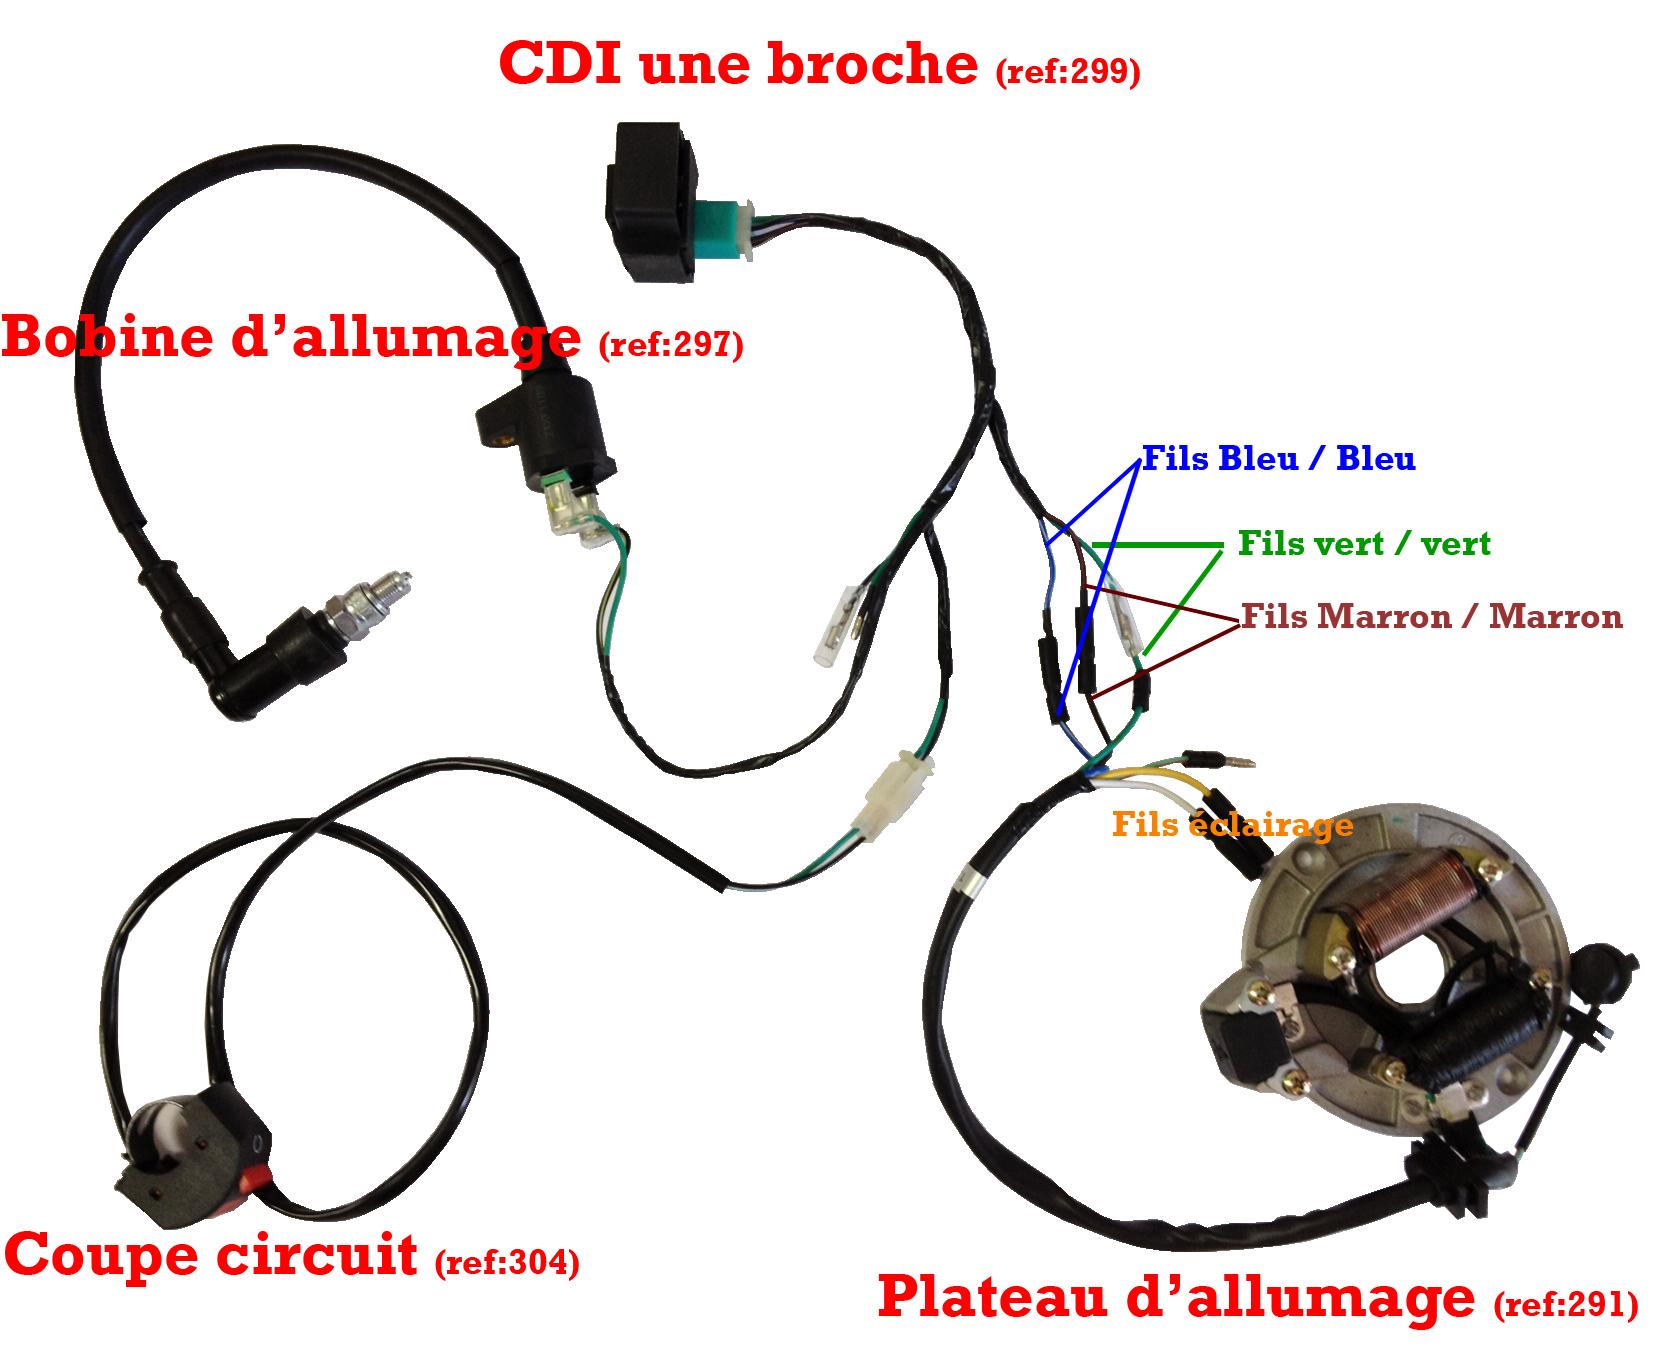 lifan 125 pit bike wiring tao tao 125 pit bike wiring